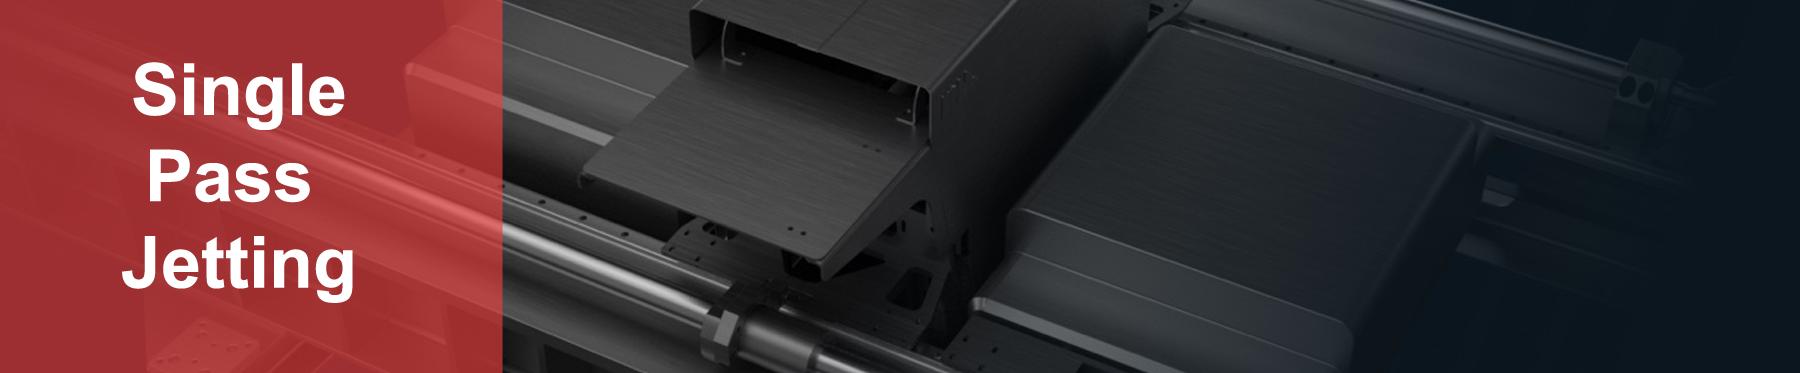 Single Pass Jetting   Production System - Creatz3D